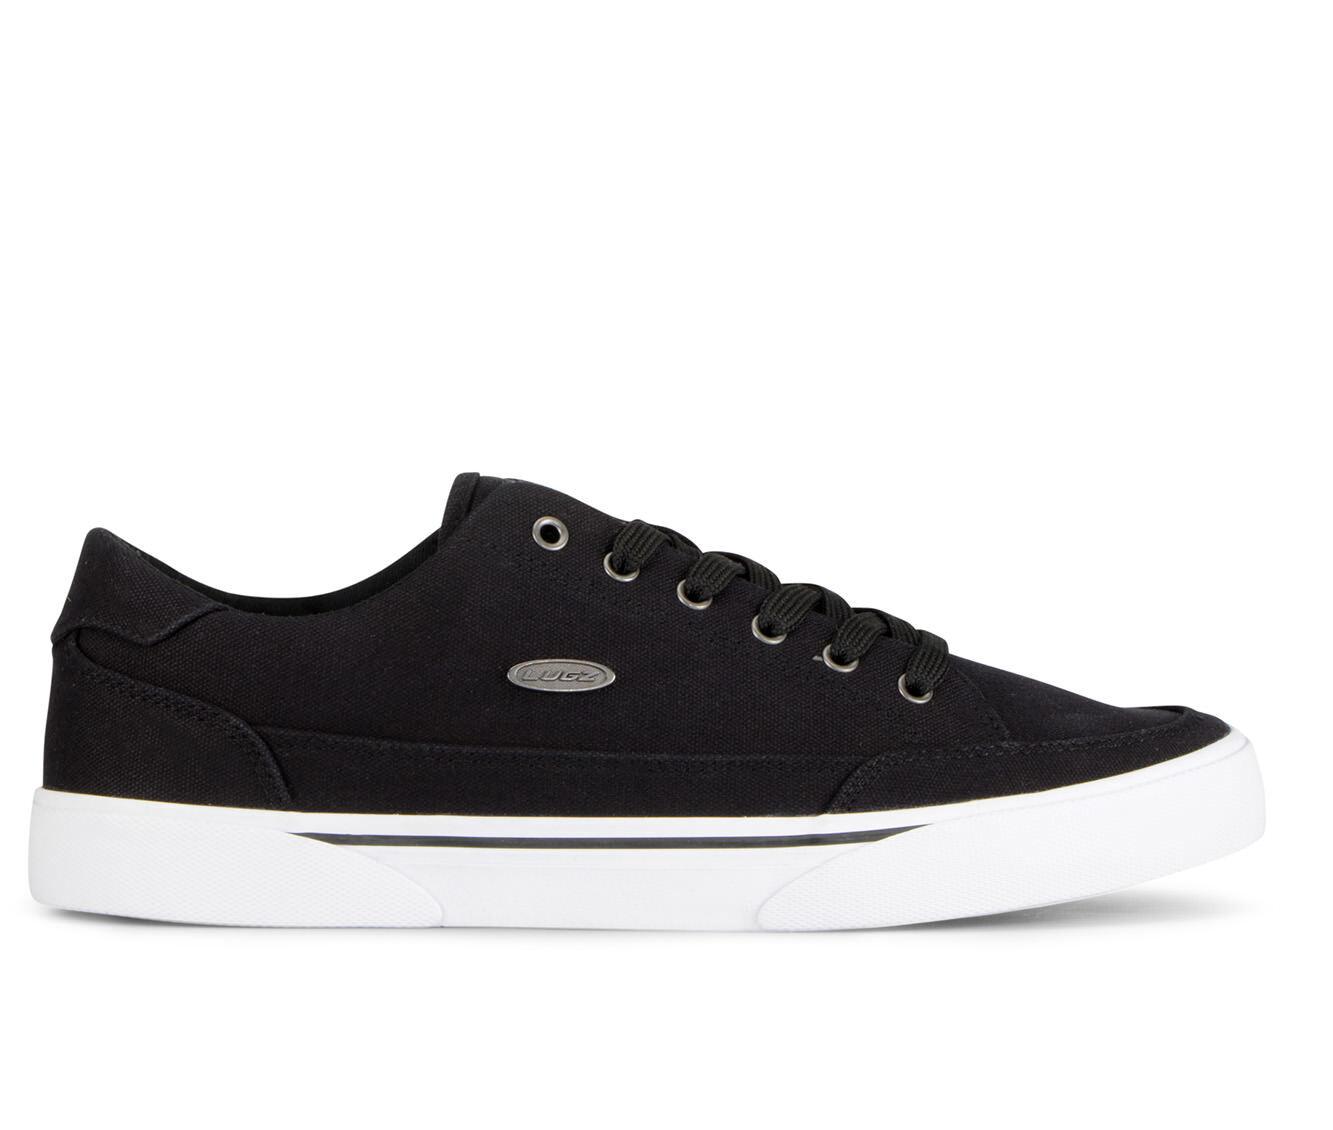 uk shoes_kd2045